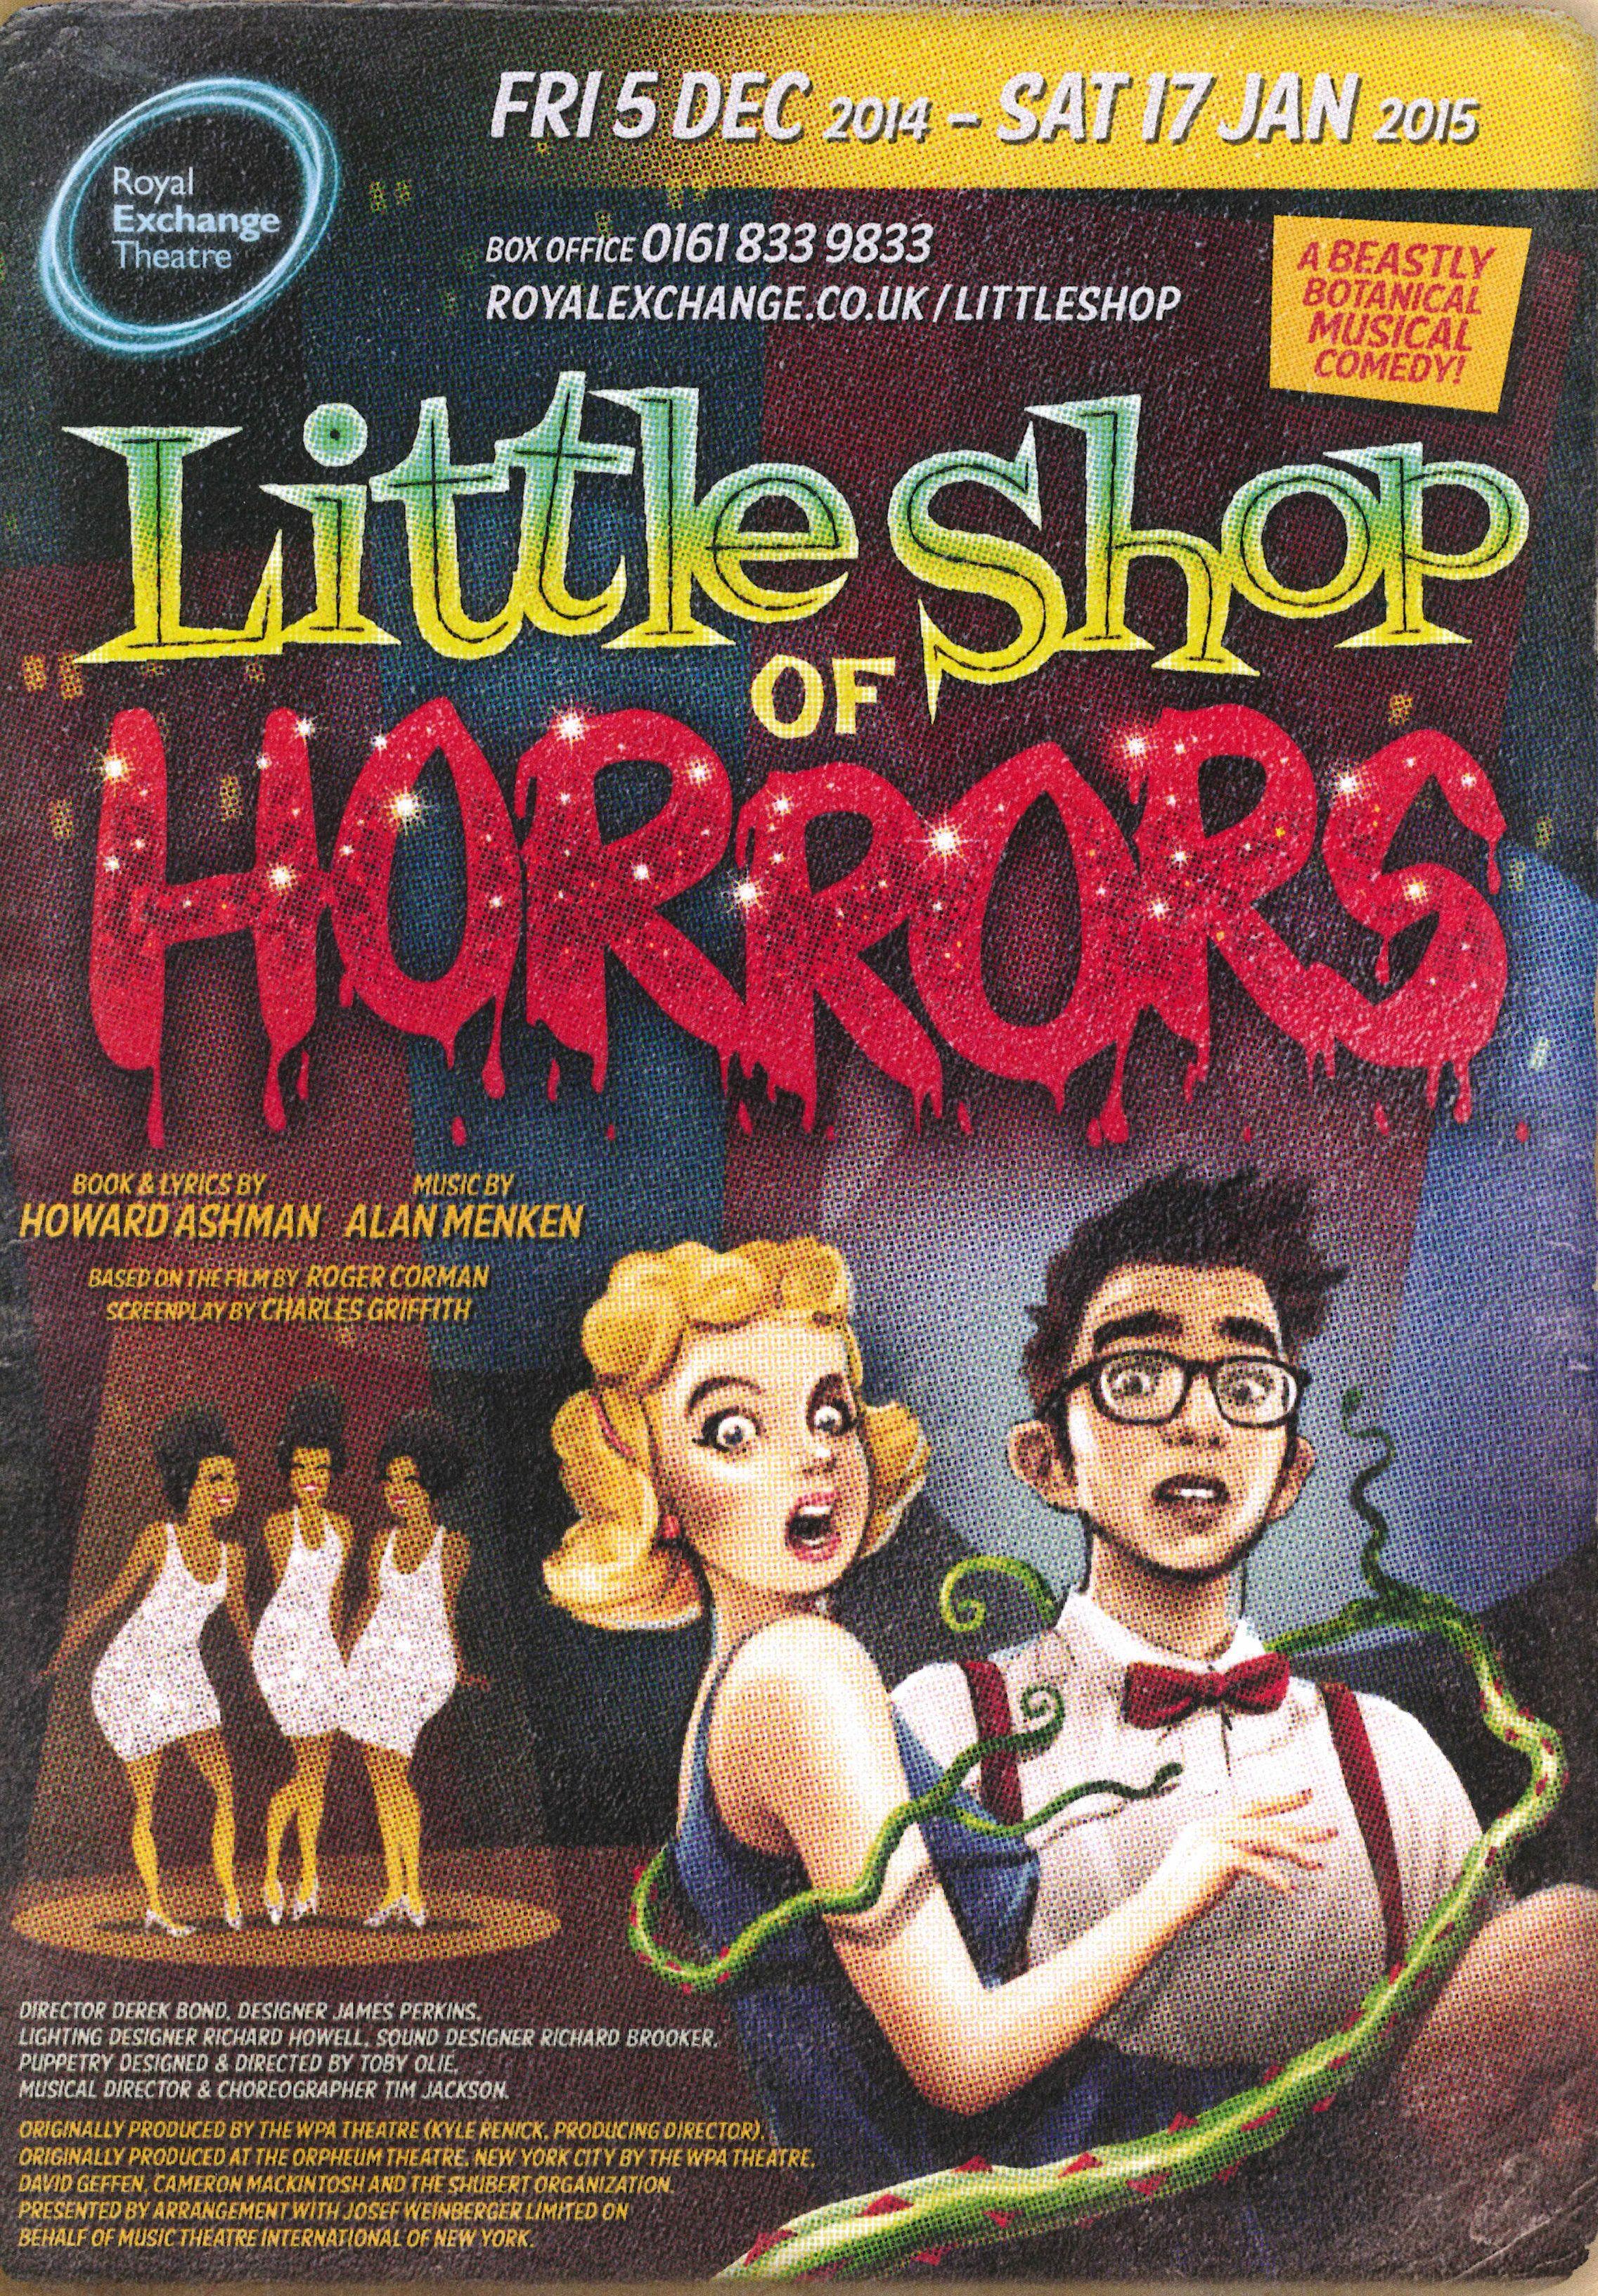 Manchester Royal Exchange Little shop of horrors, Horror